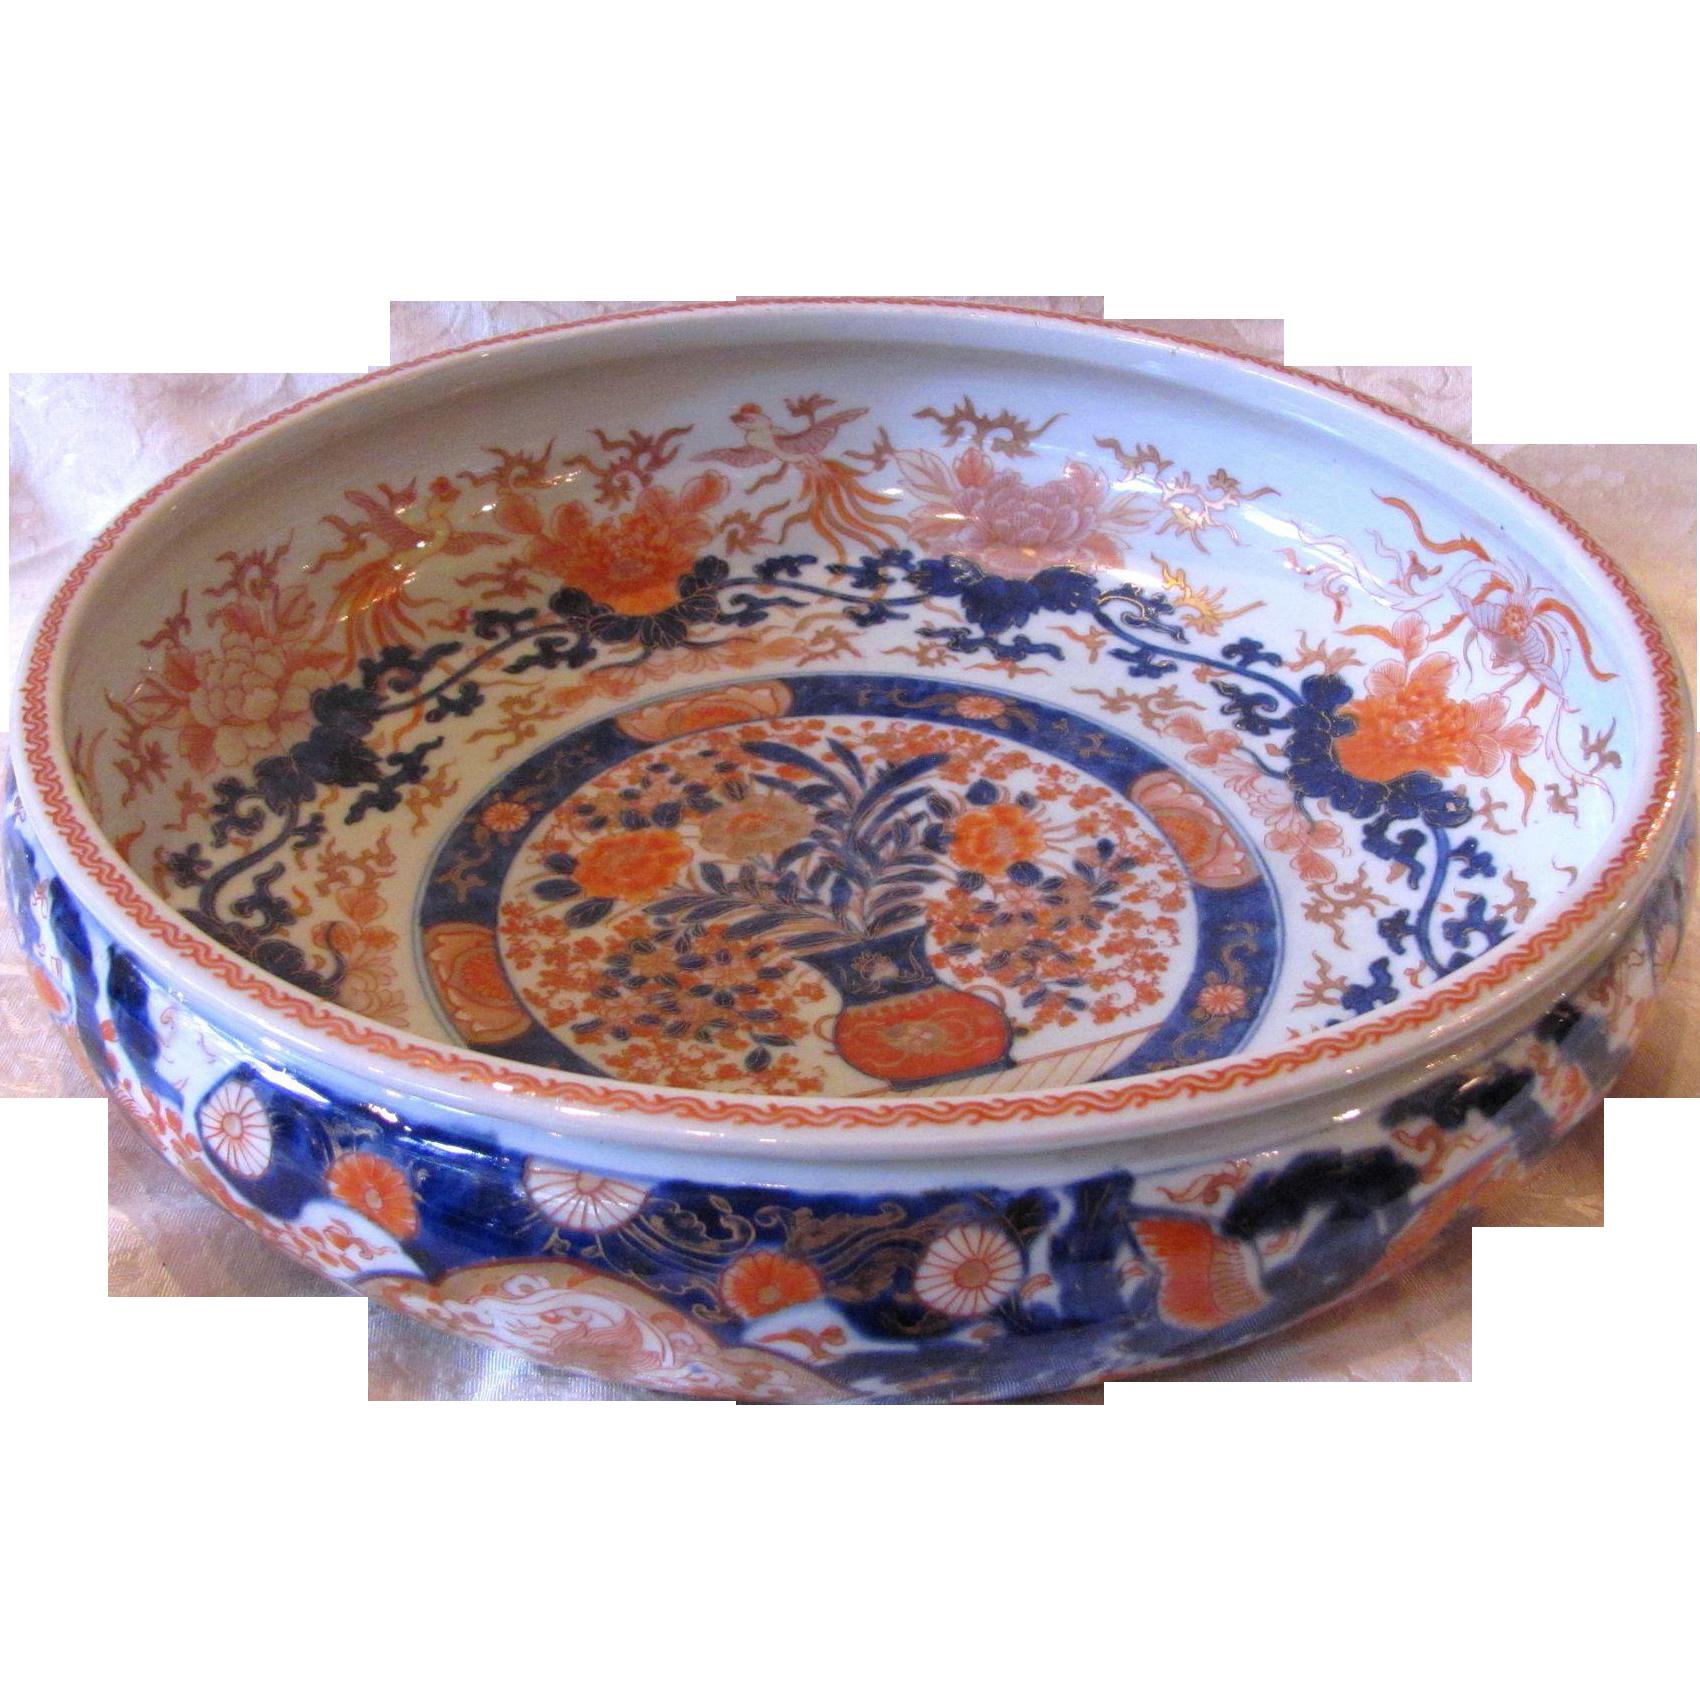 Large Antique Japanese Imari Bowl Late Edo Period Circa 1850